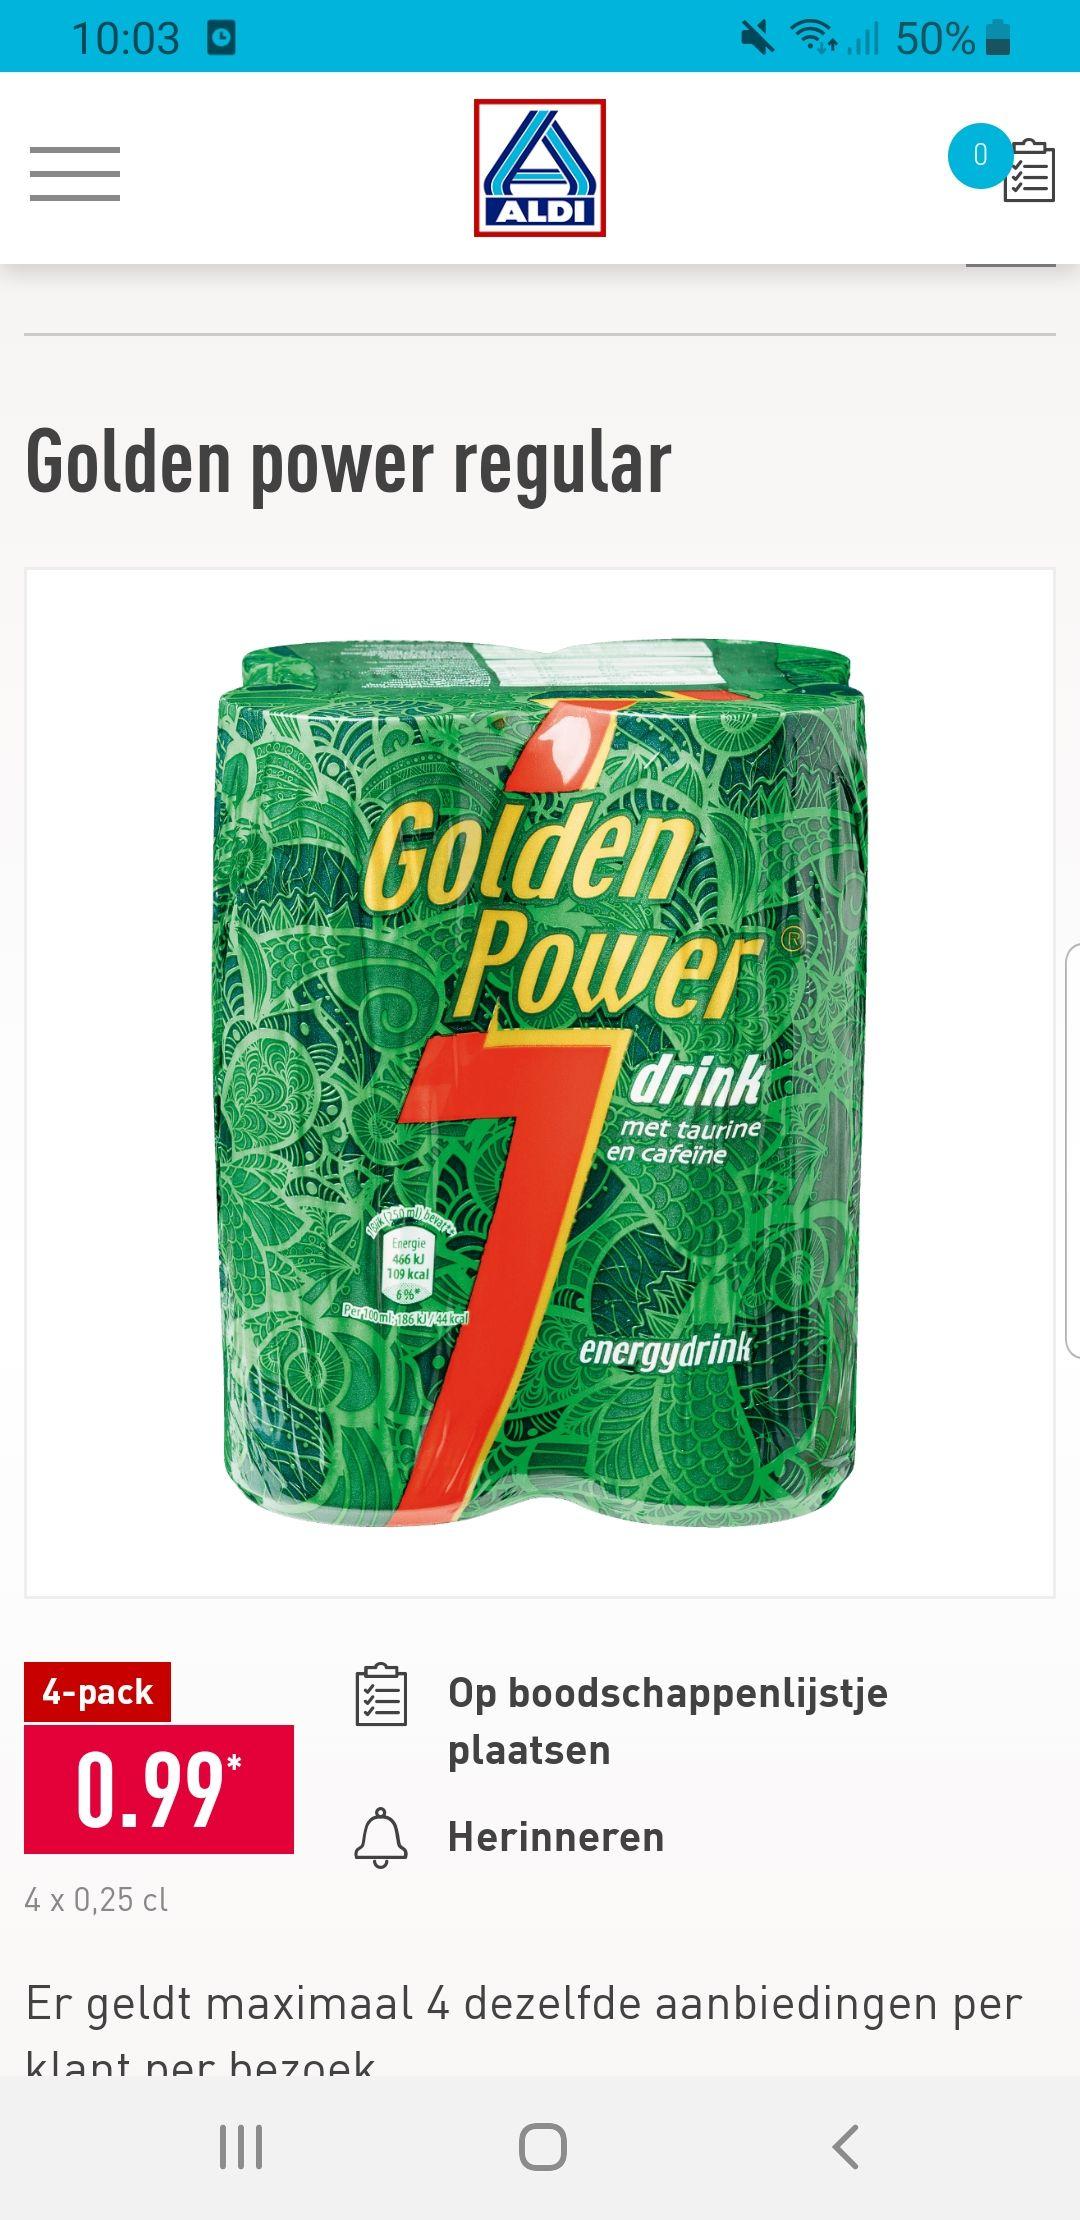 4 blikjes Golden Power voor 99 cent (= ruim 40% korting)